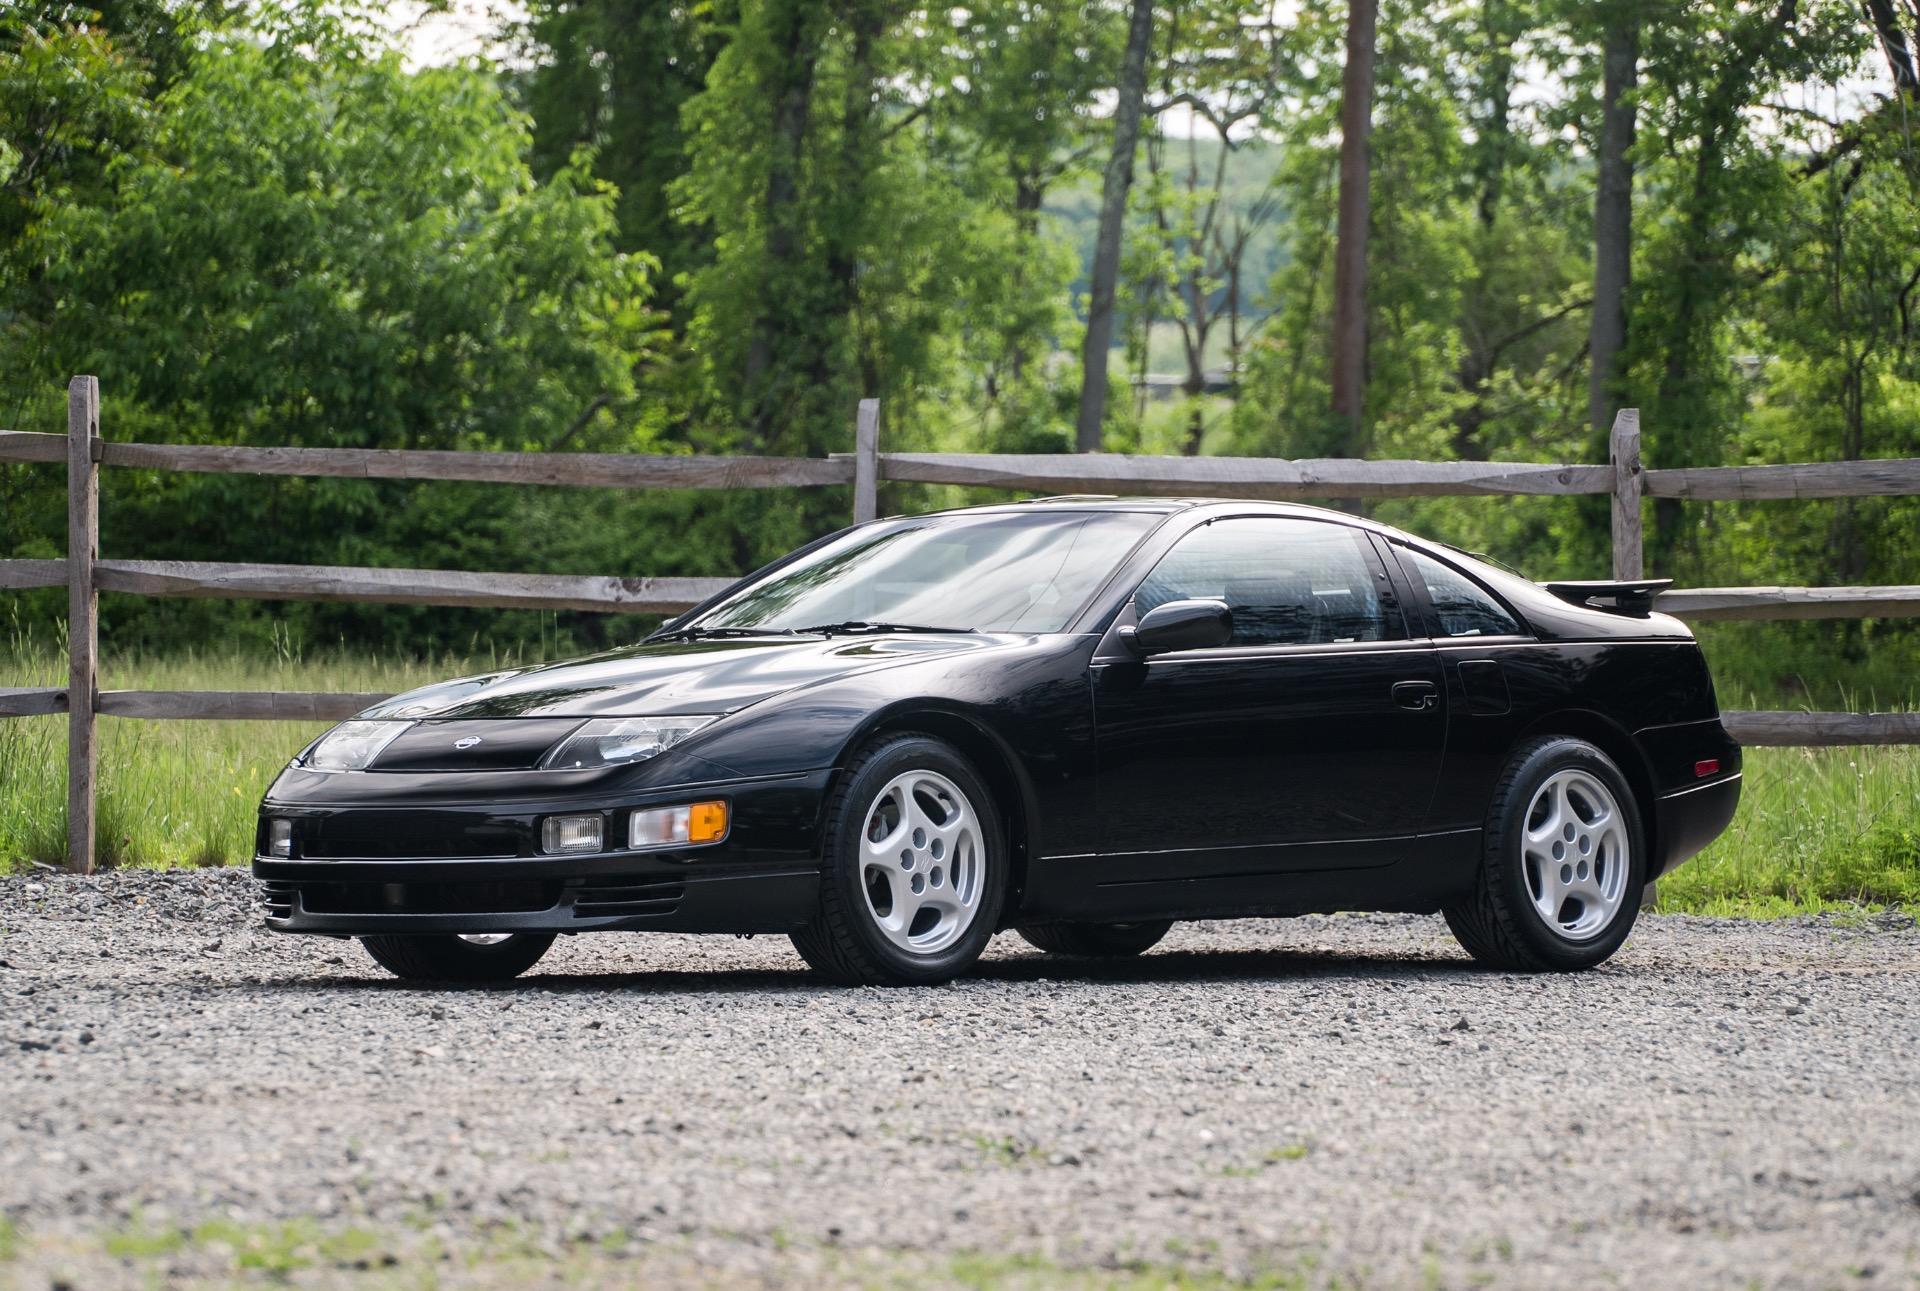 Delightful 1996 Nissan 300ZX Turbo Turbo